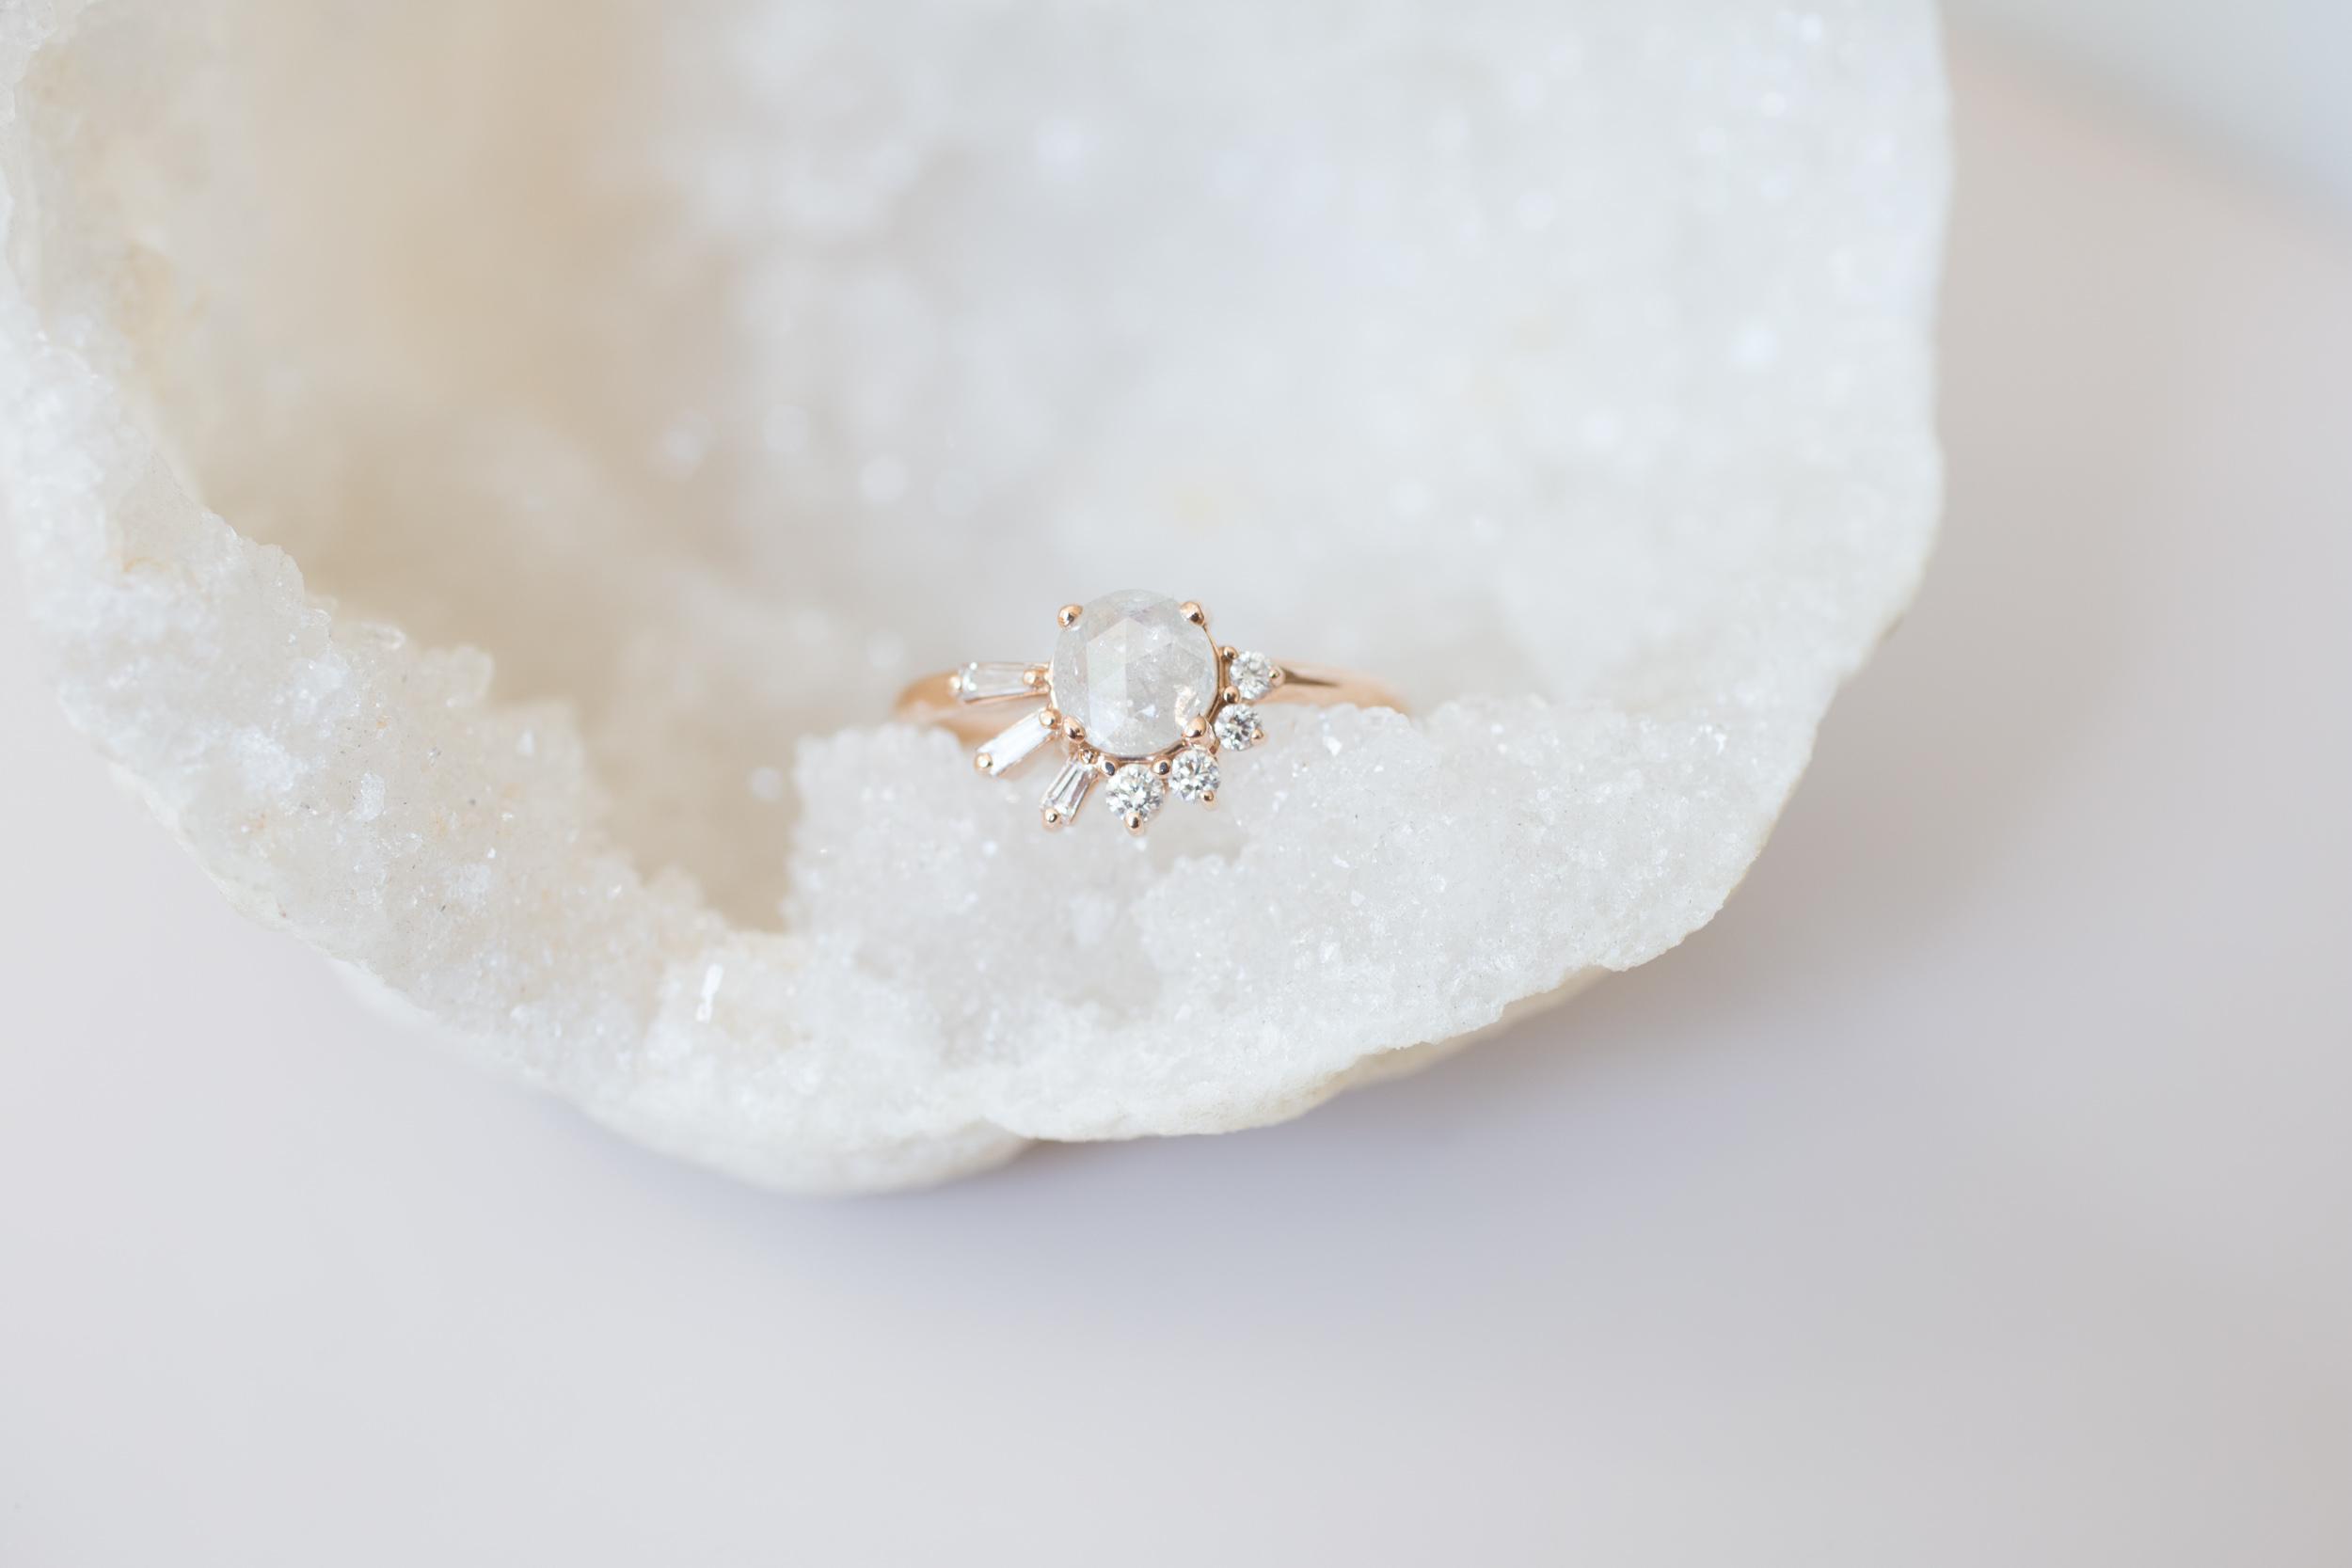 Peter J. Rustic Diamond Baguette Round Cluster Ring-4.jpg